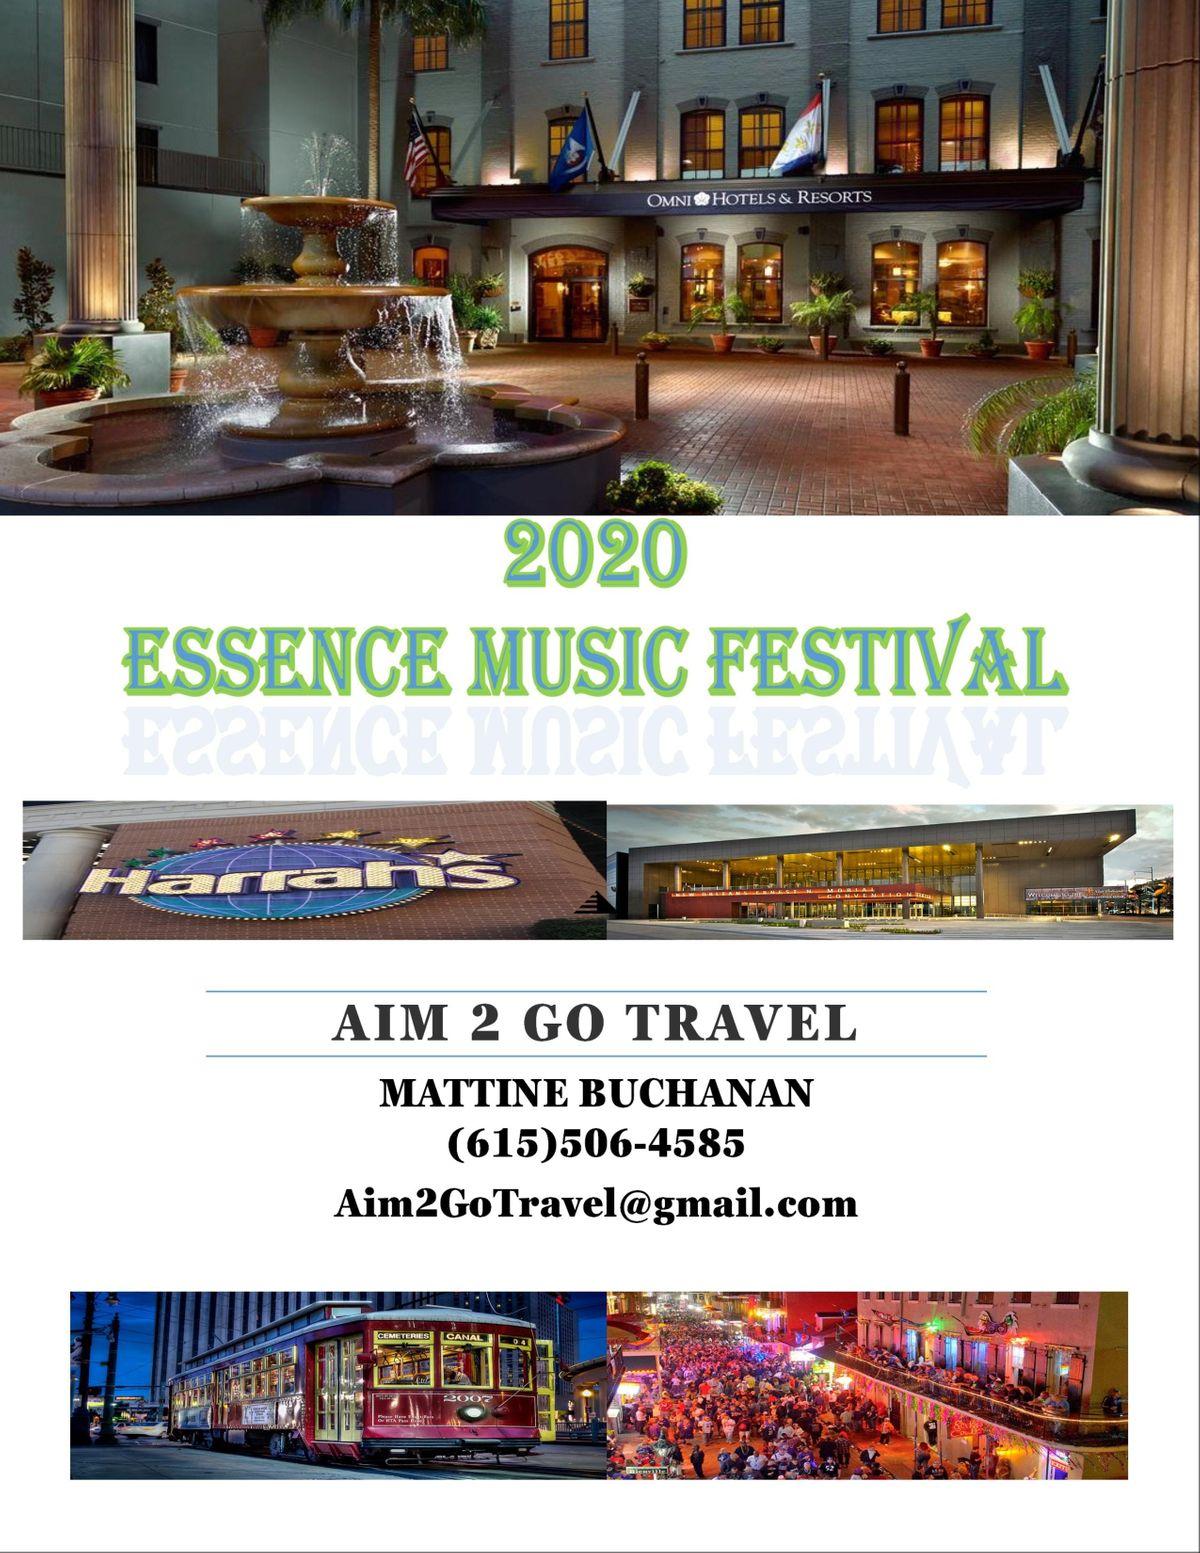 Essence Music Festival 2020.Essence Music Festival 2020